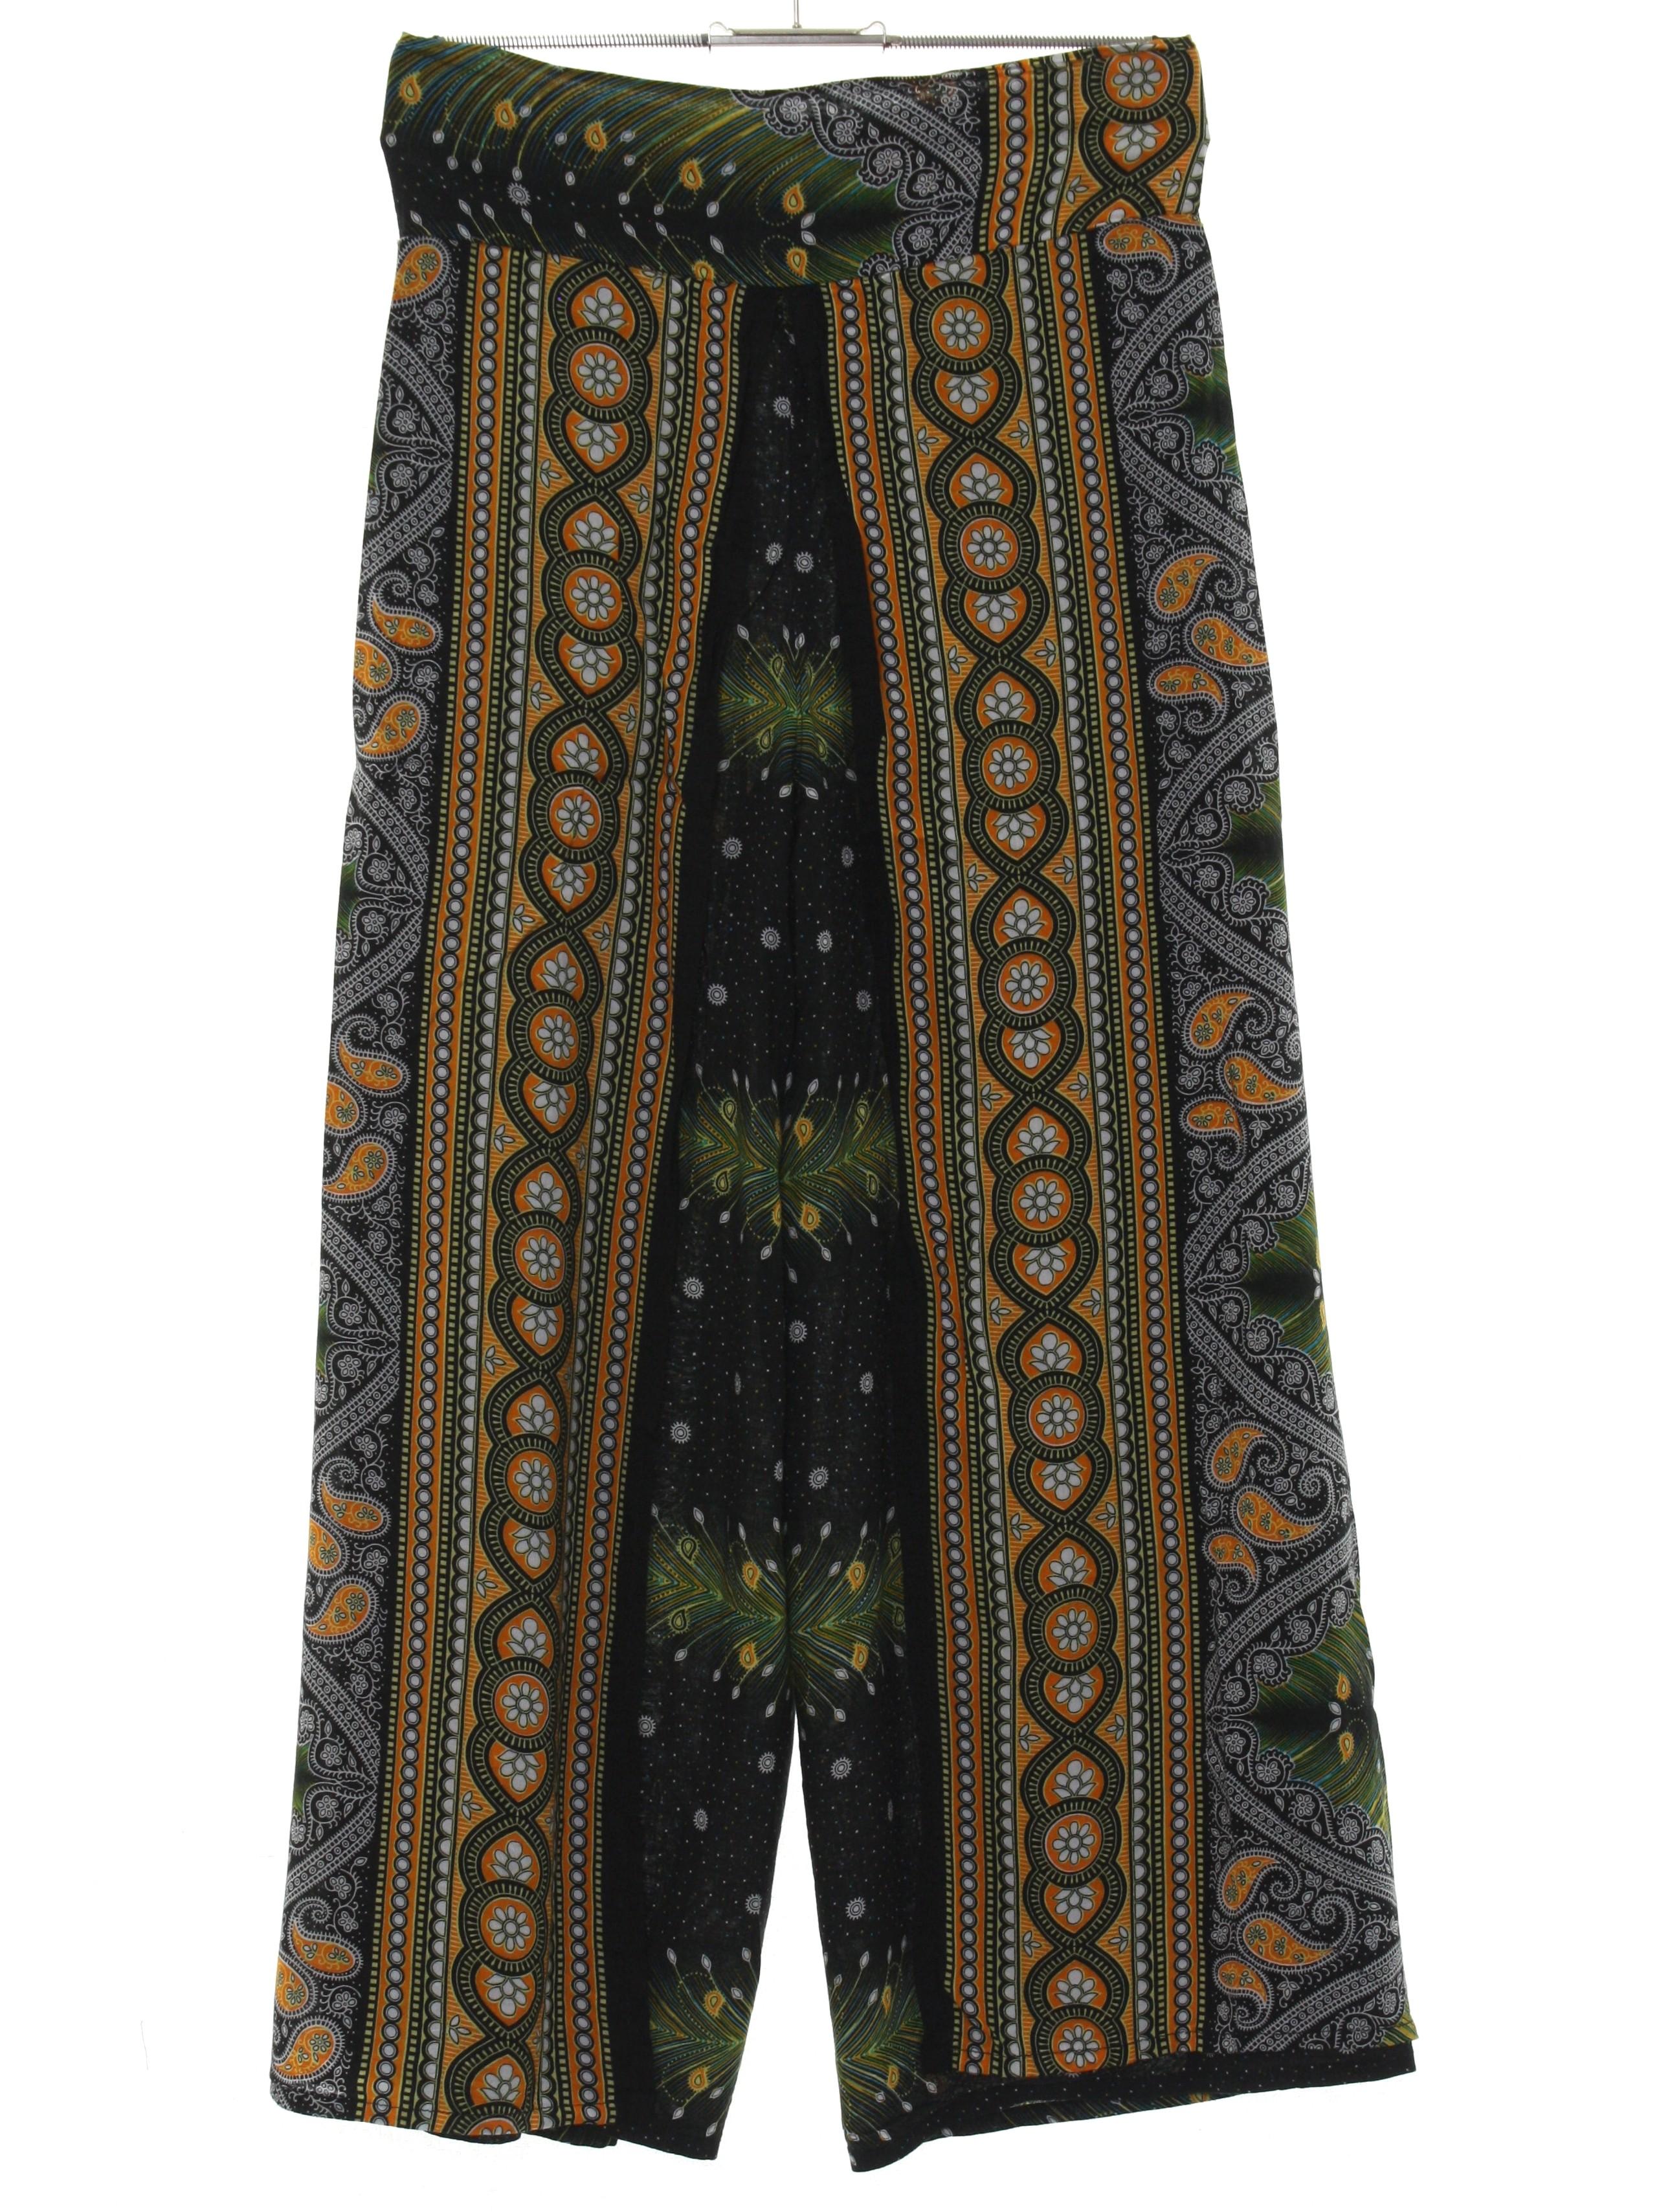 Vintage 1970s Hippie Wrap Around Striped Skirt